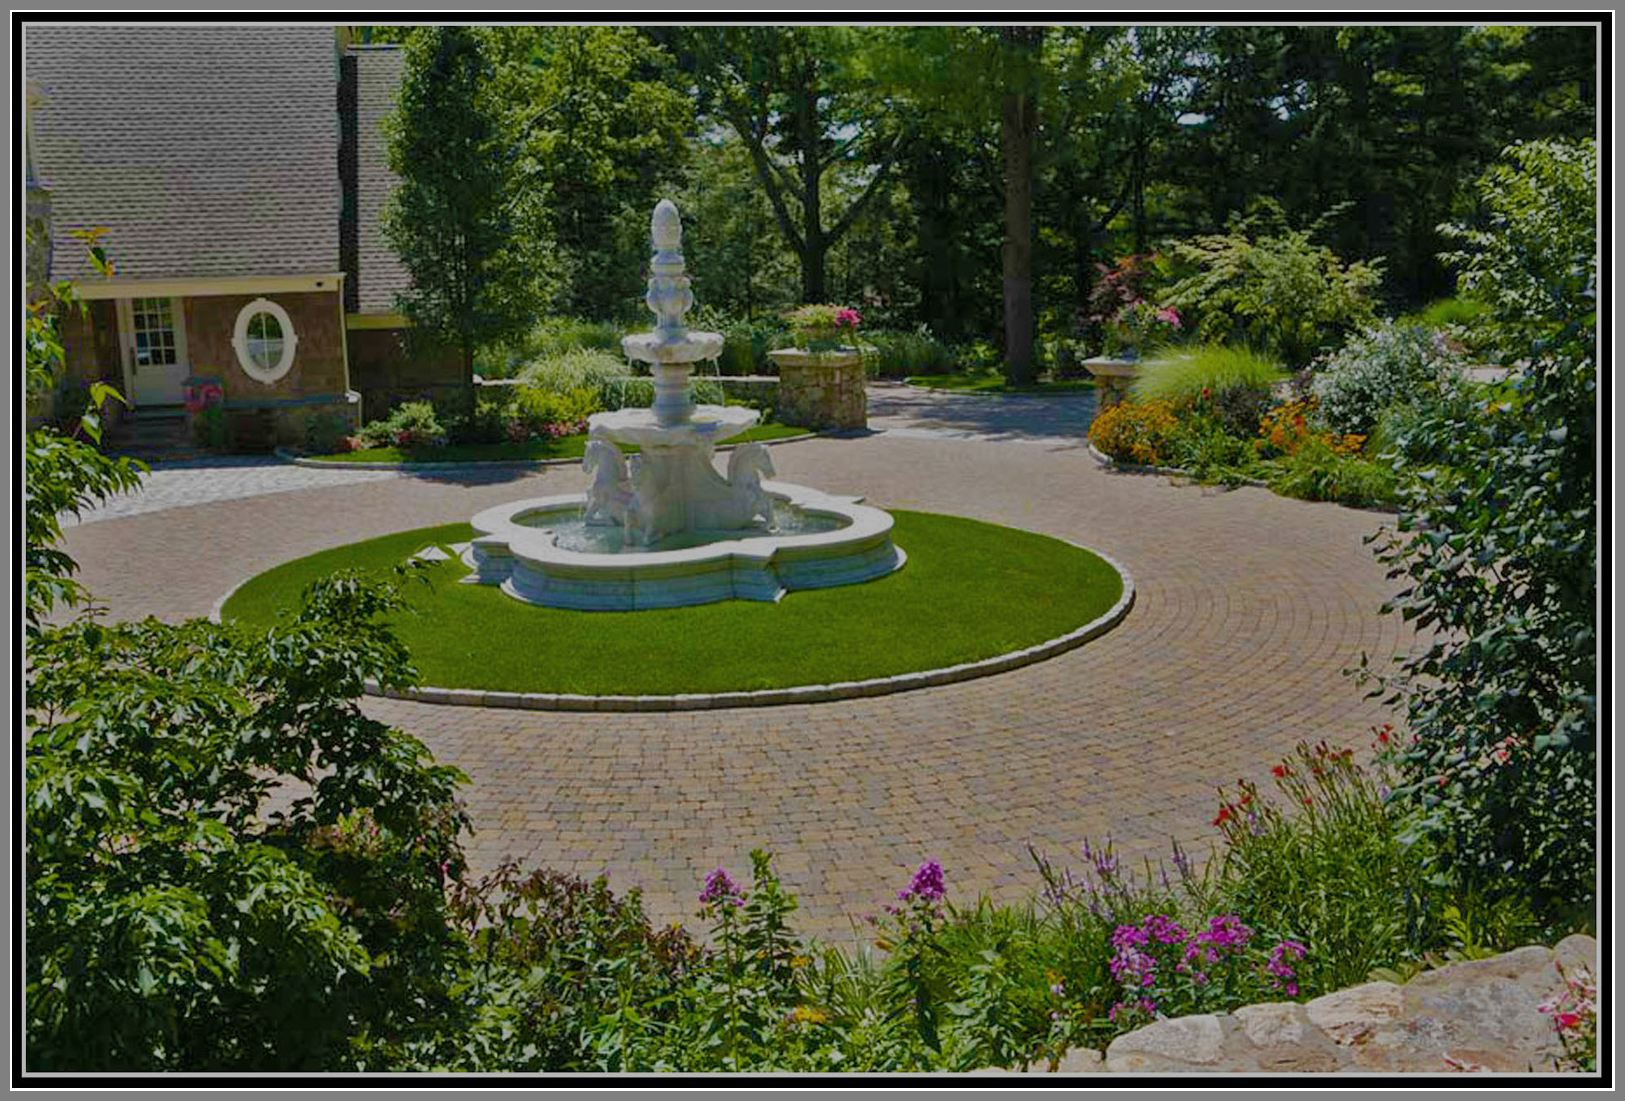 Courtyard with circular island enhanced by fountain